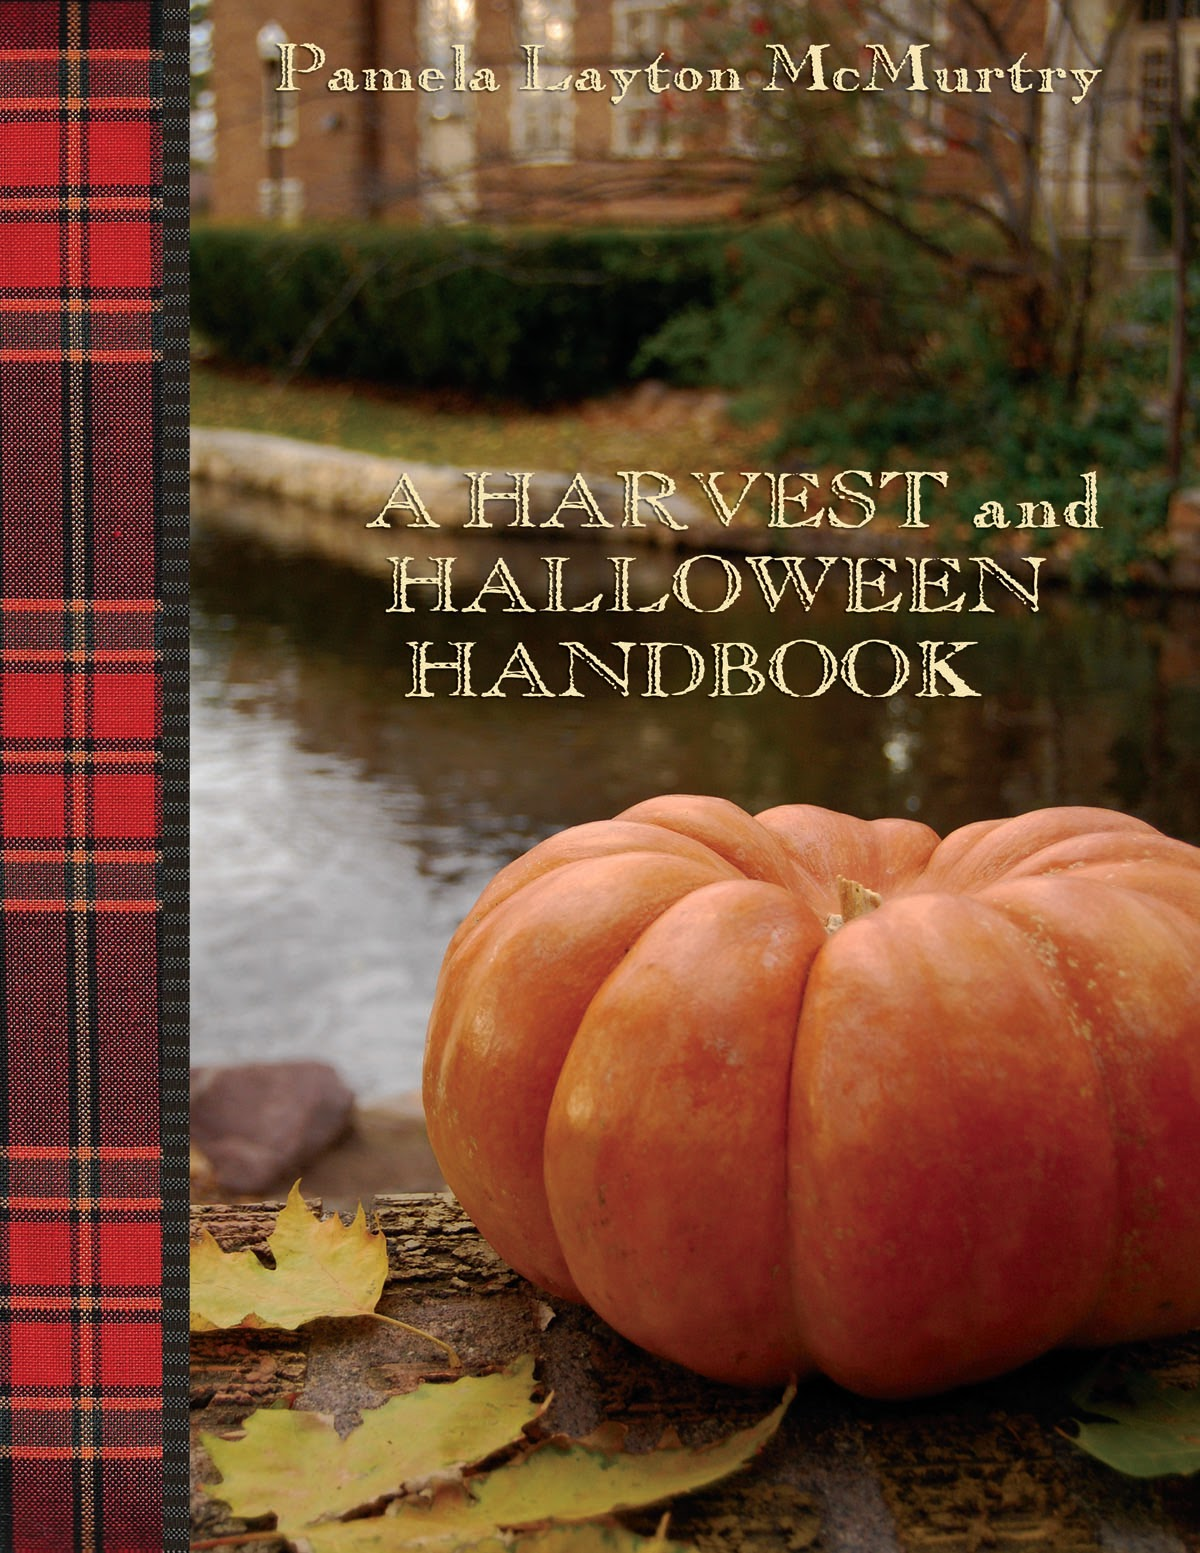 September 2013 mcmurtry creative media httpamazonharvest halloween handbook artisan ebook dpb009pa8on6refsr11ieutf8qid1379770382sr8 1keywordsaharvestand halloween fandeluxe PDF